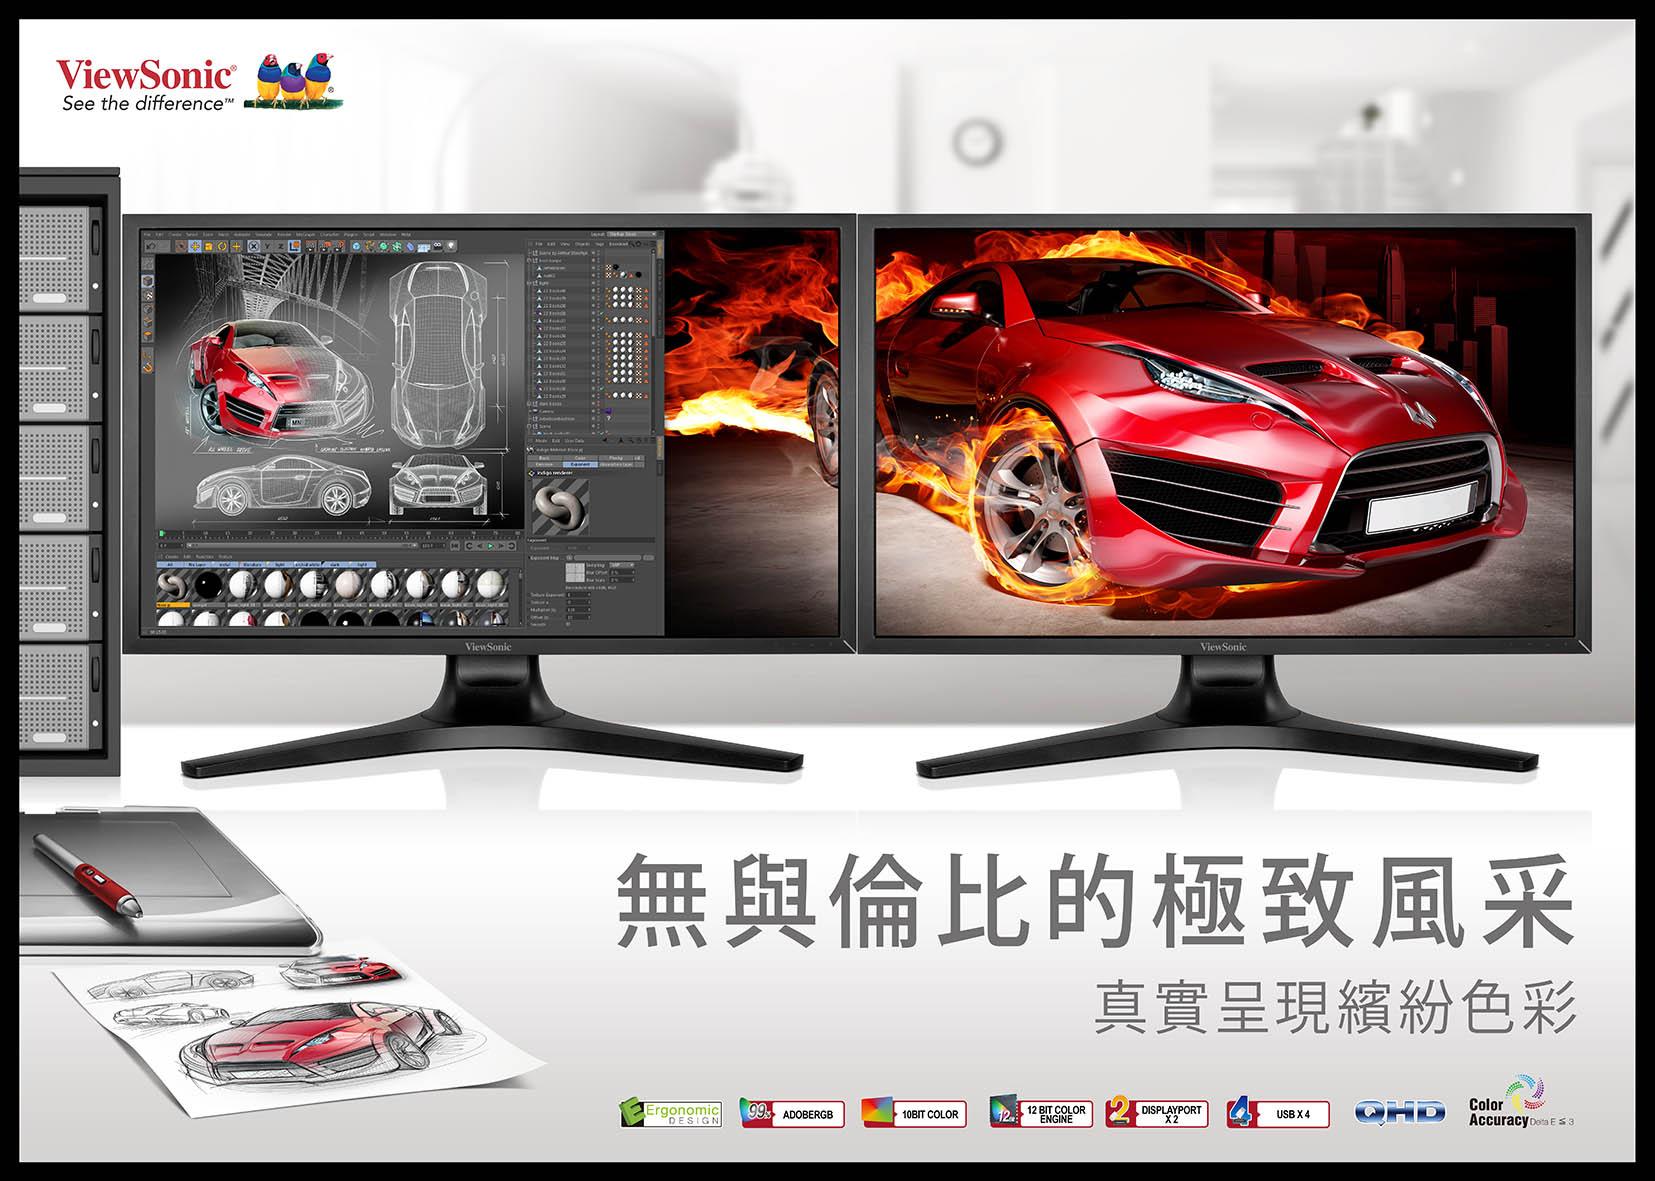 ViewSonic 拓展高階專業顯示器市場 打造完美設計繪圖解決方案